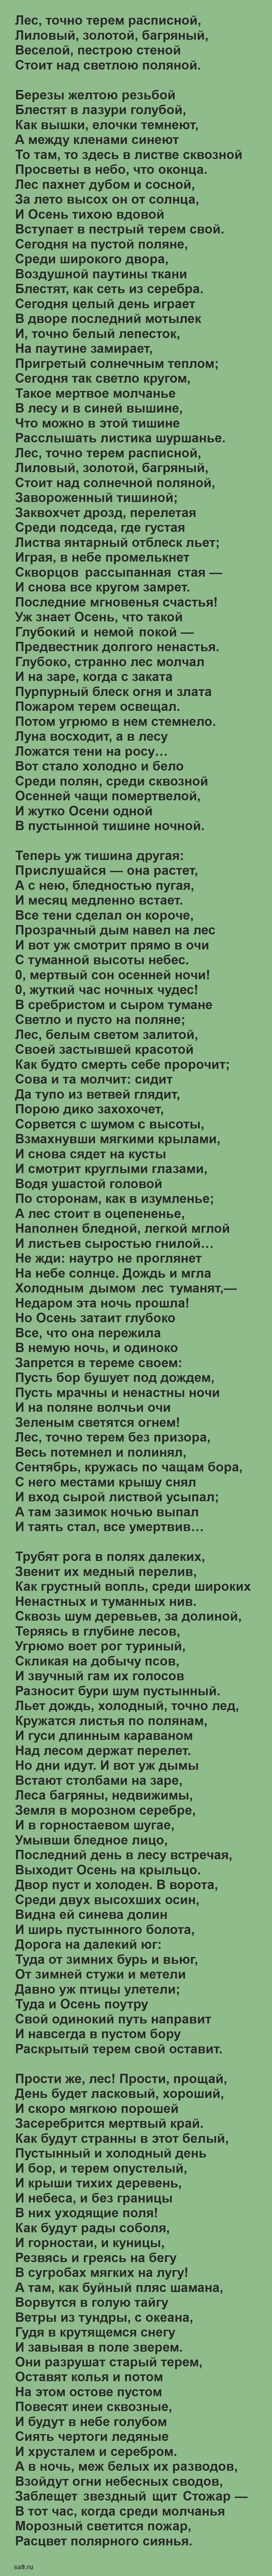 Стих Бунина - Листопад